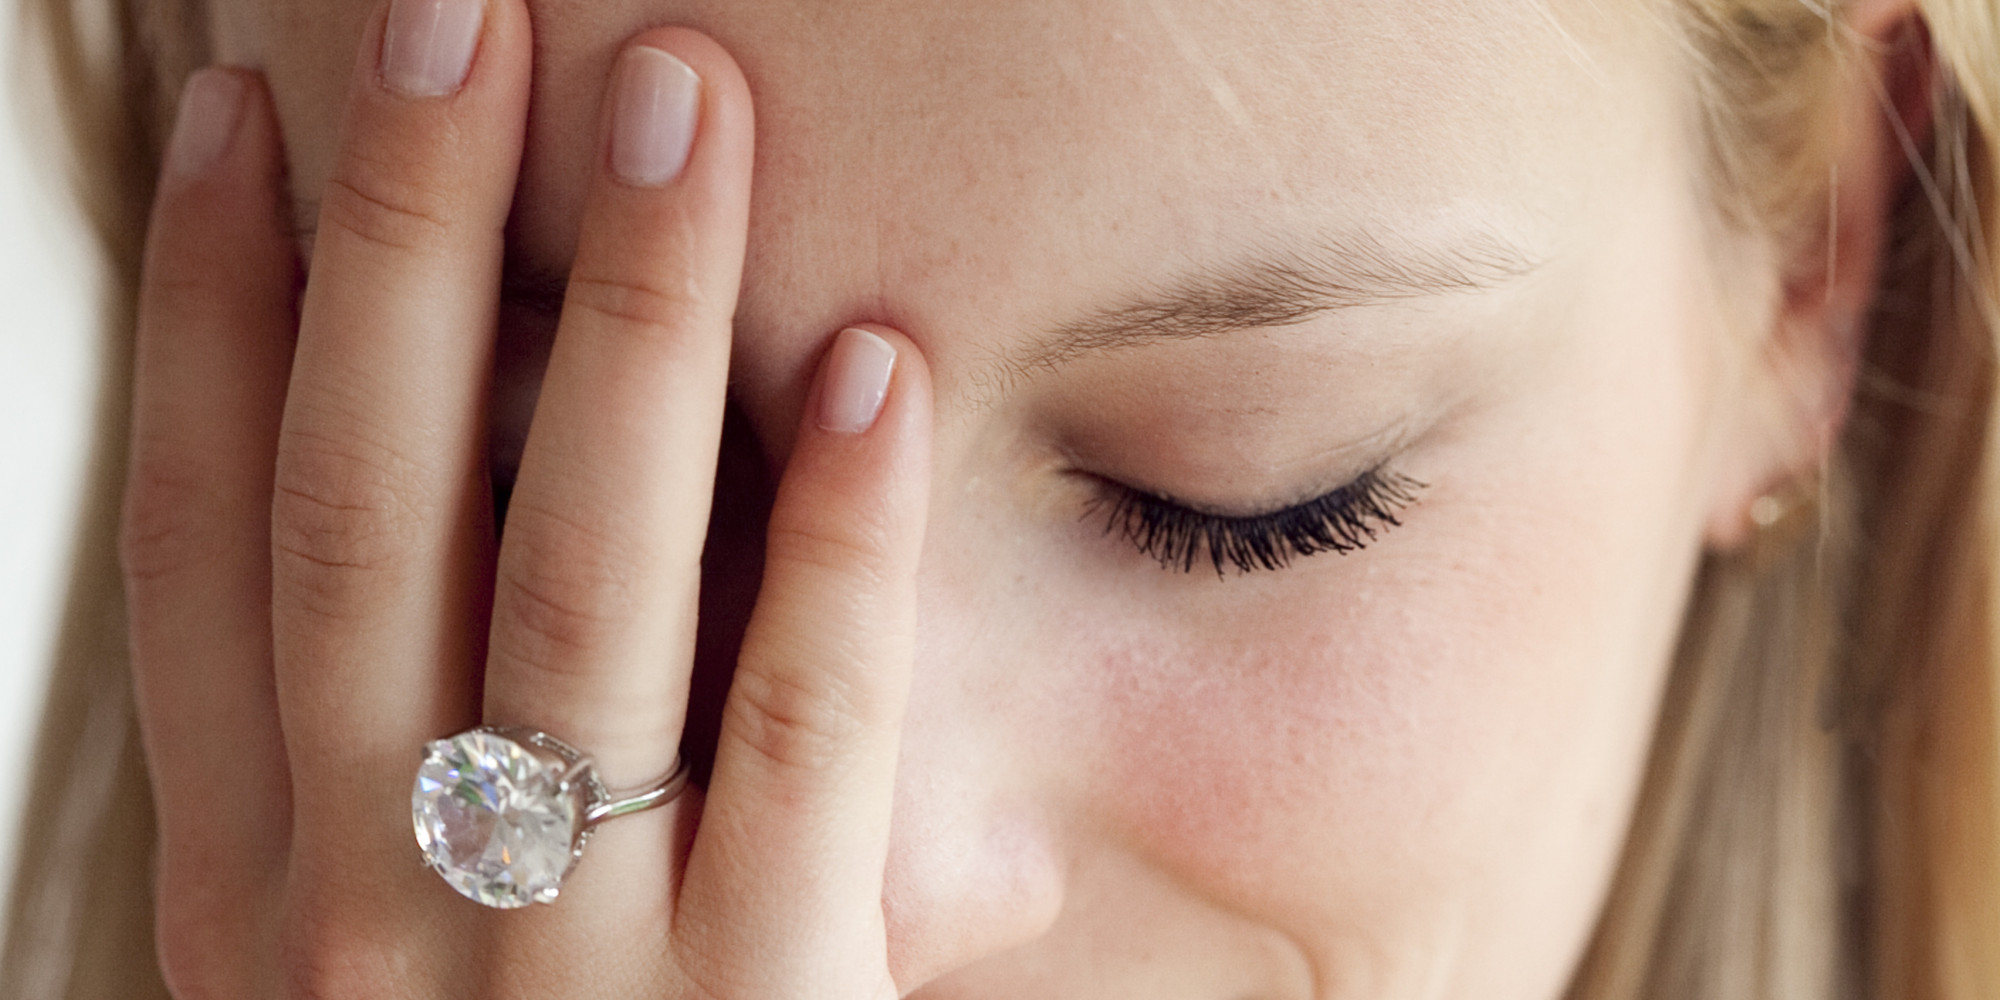 My Response to Women With Big Diamonds